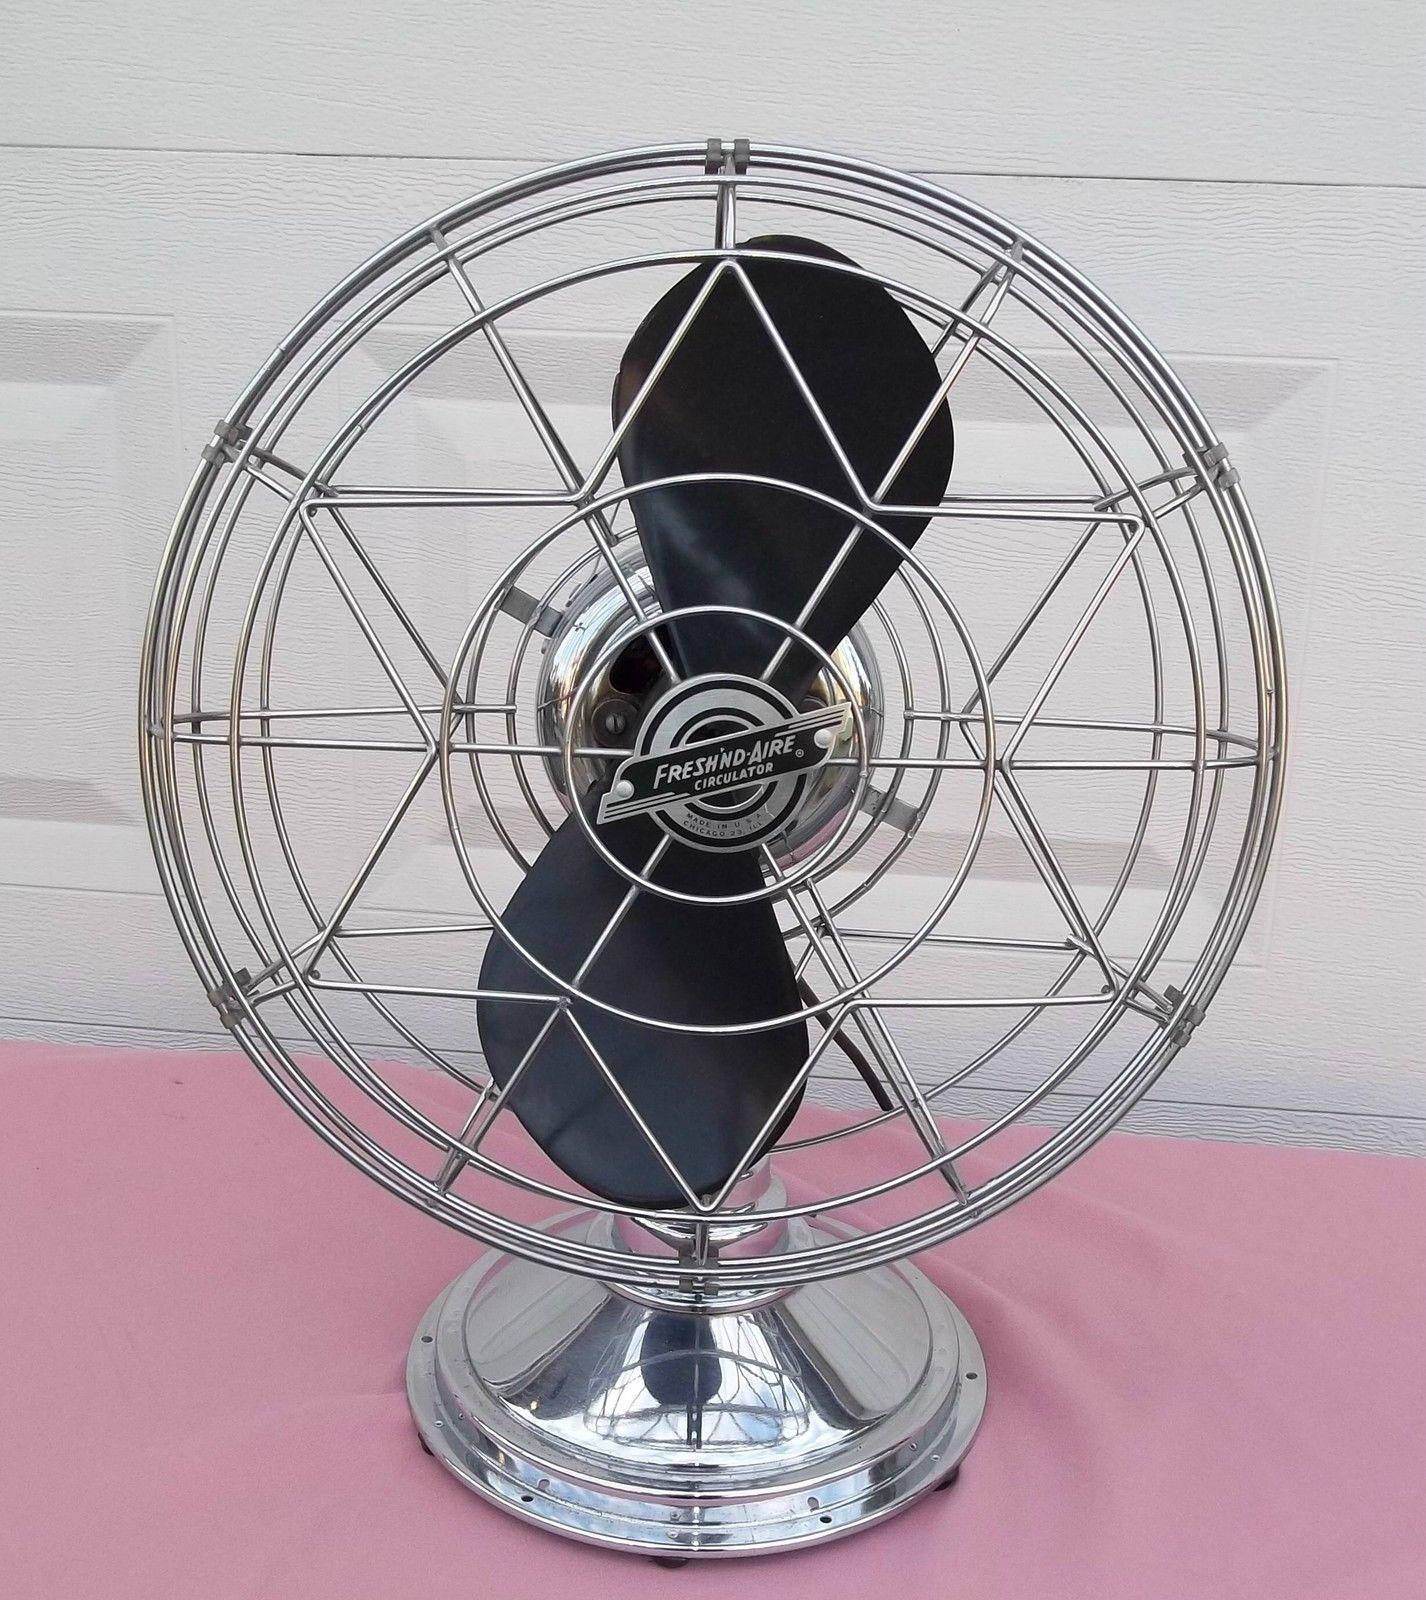 Vintage Fresh Nd Aire 3 Speed Chrome Fan Model 14 Industrial Mid Century Antique Fans Vintage Fans Fan